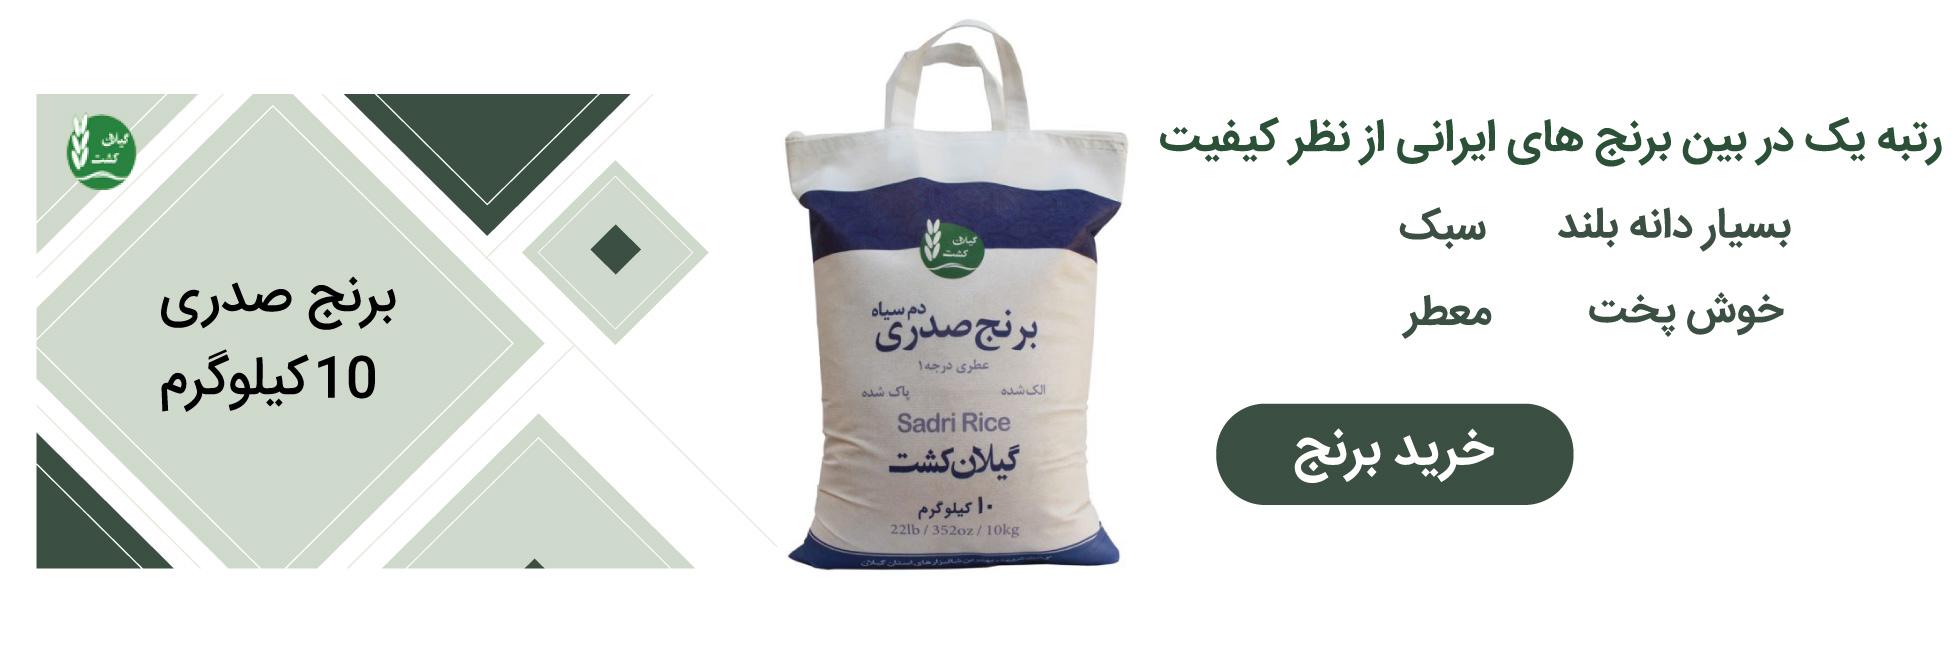 برنج صدری 10 کیلوگرمی اصل